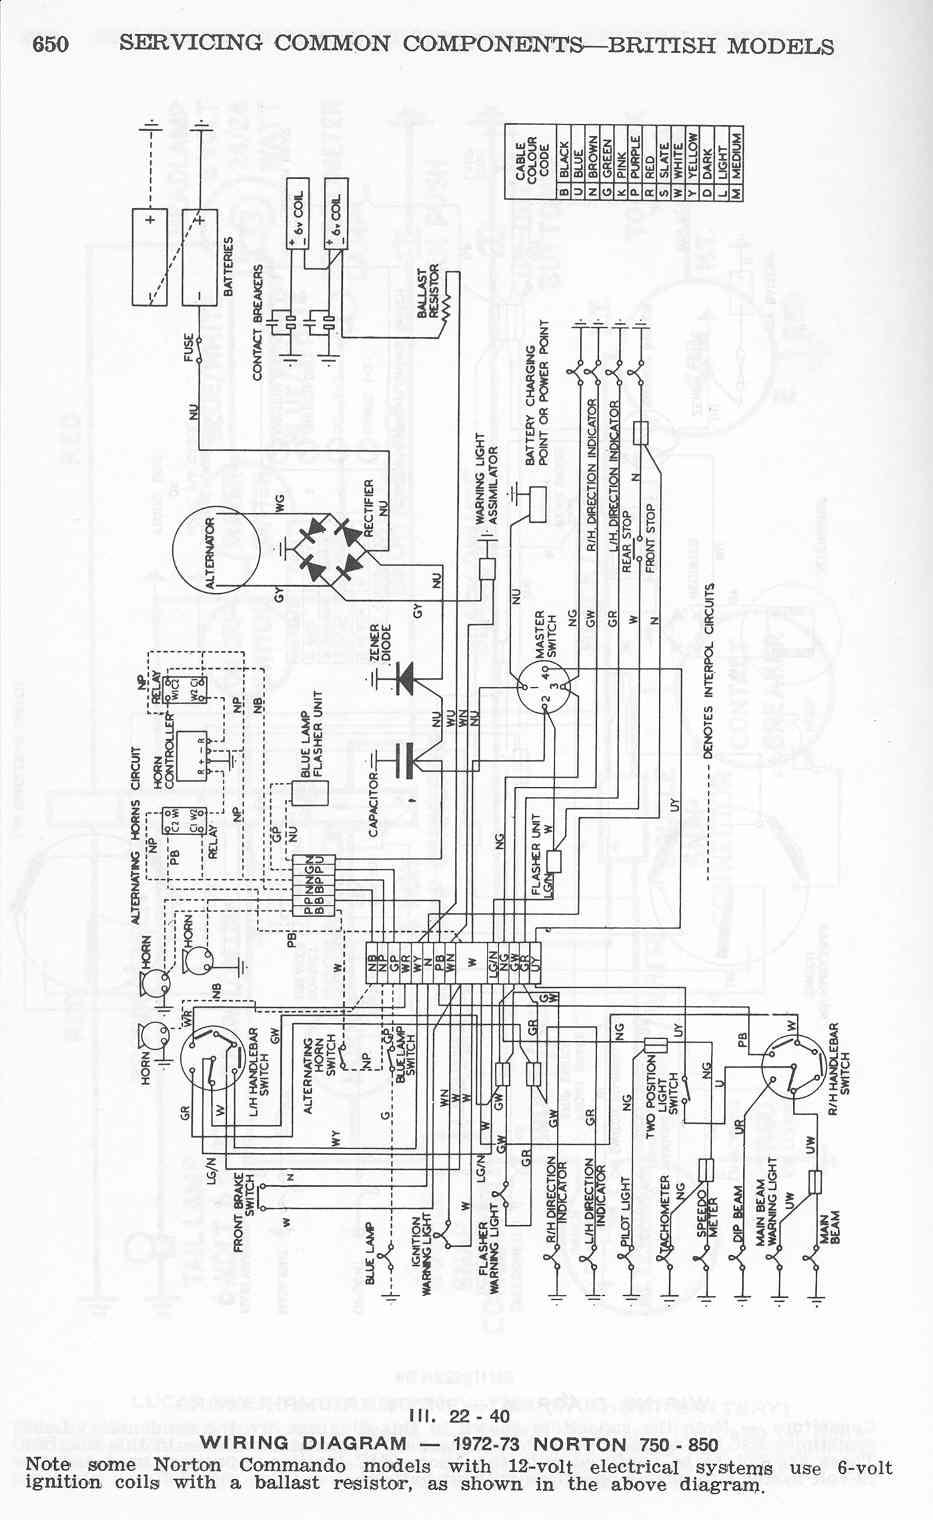 medium resolution of 1972 norton commando wiring diagram transgarp dyndns org motorcycle jpg